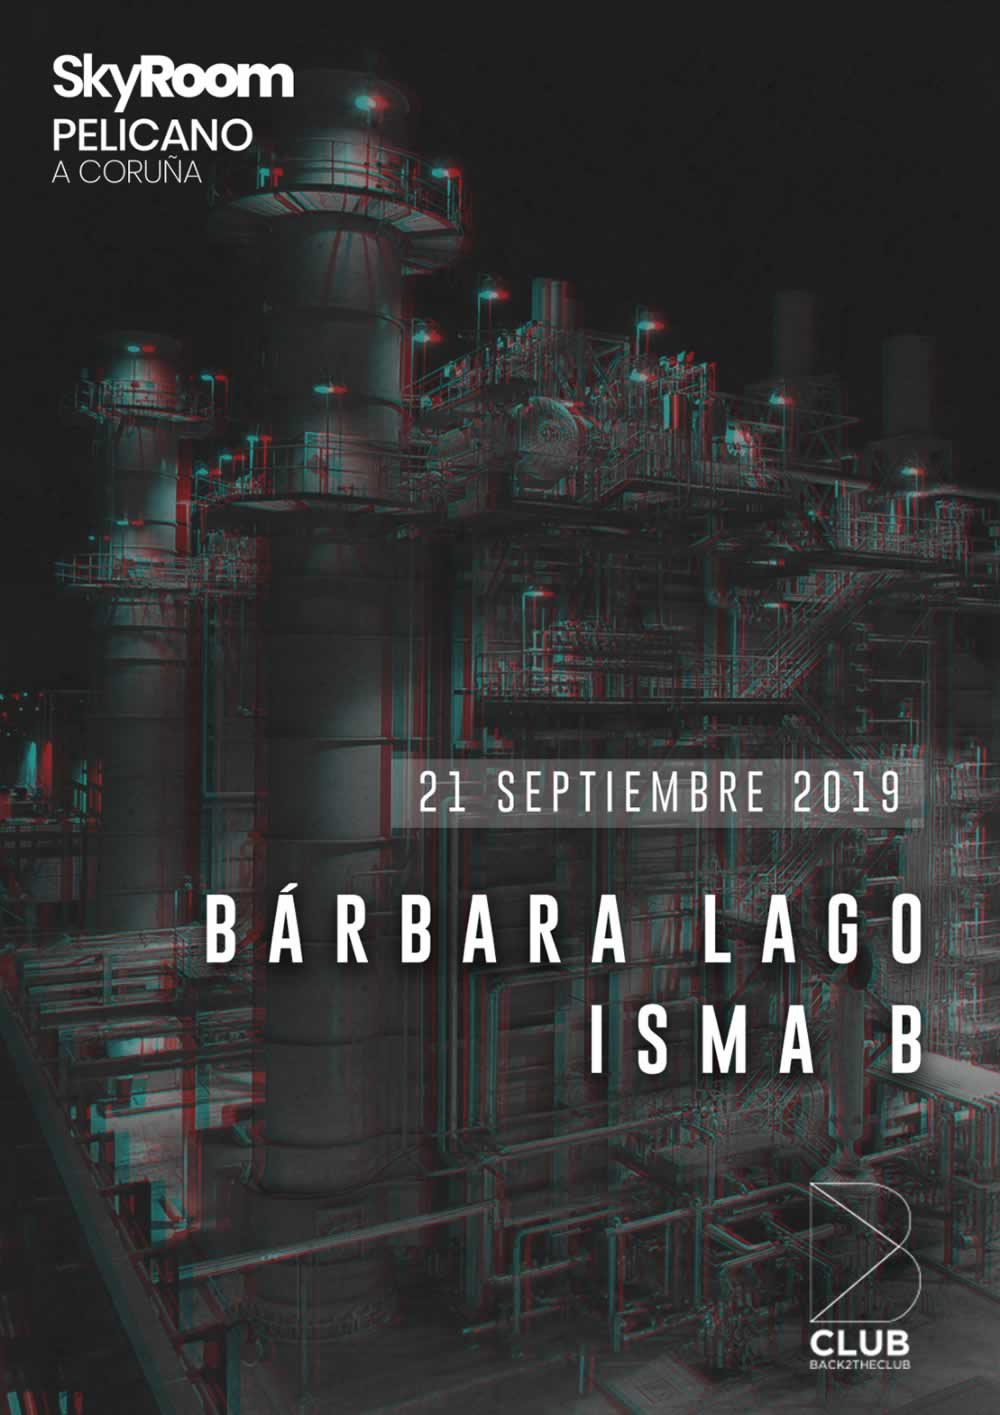 Barbara Lago - Isma B